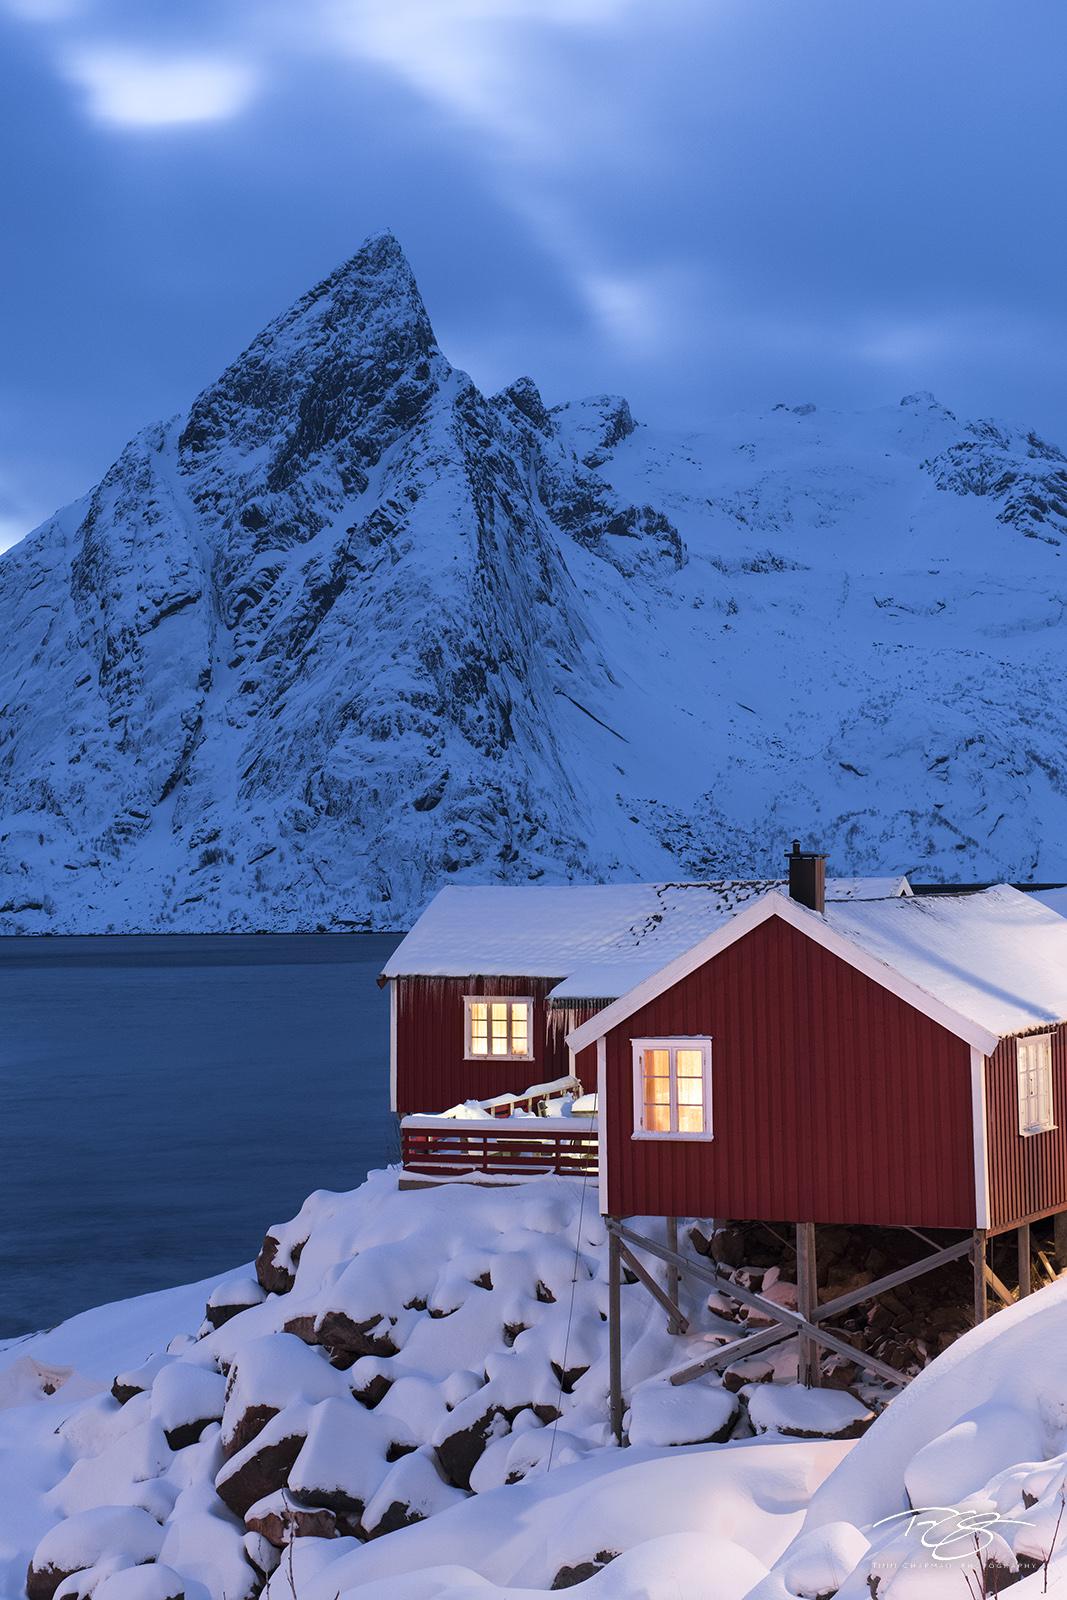 norway, gallery, lofoten, Hamnøy, hamnoy, Hamnøya, Sakrisøya, Sakrisoy, olstinden, snow, fishing village, Moskenes, Reine, rorbu, rorbuer, Eliassen Rorbuer, winter, blue hour, photo